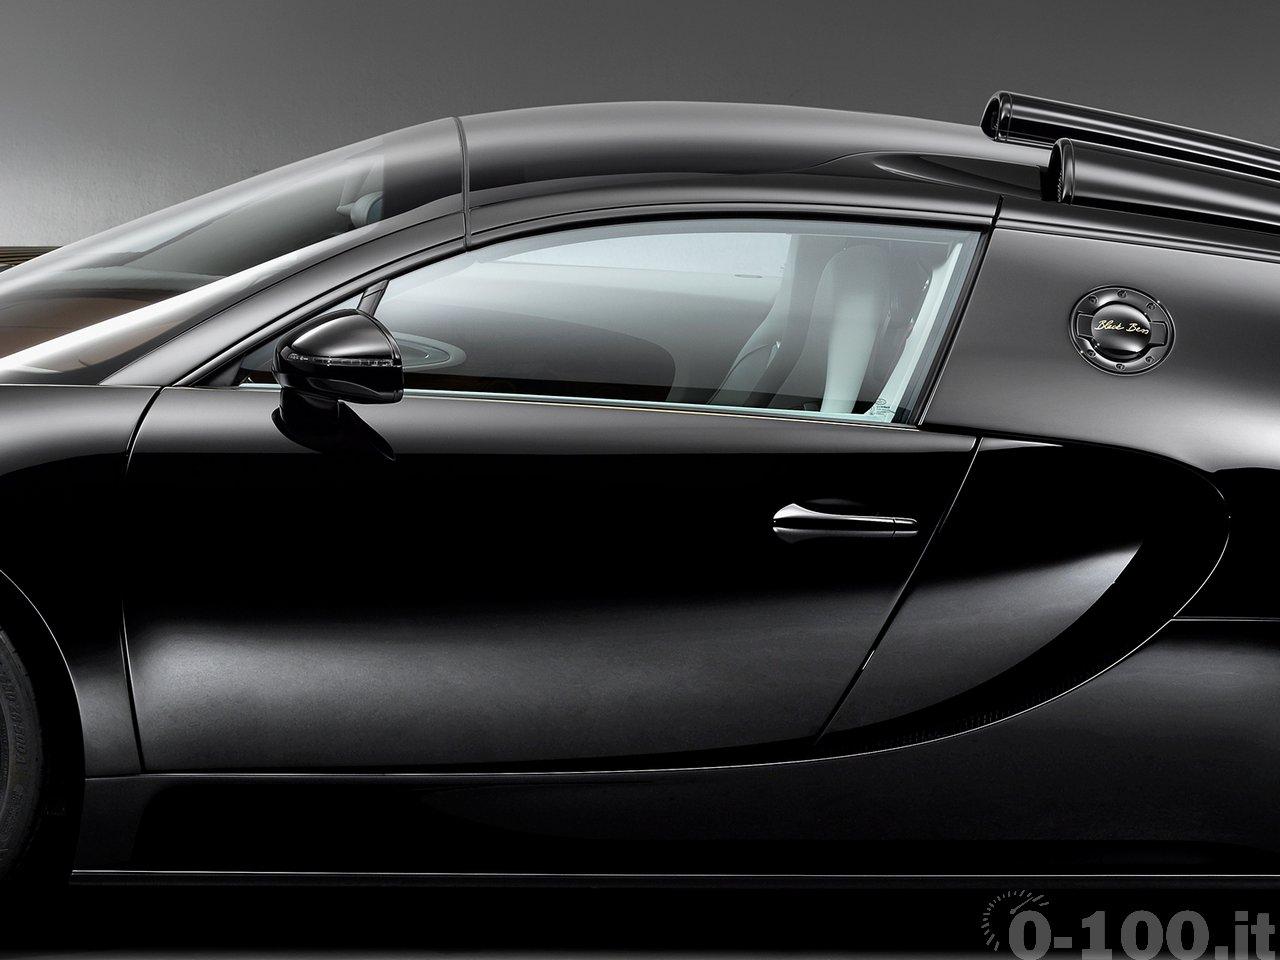 beijing-2014-bugatti-veyron-serie-speciale-les-legendes-de-bugatti-veyron-16-4-grand-sport-vitesse-black-bess_18